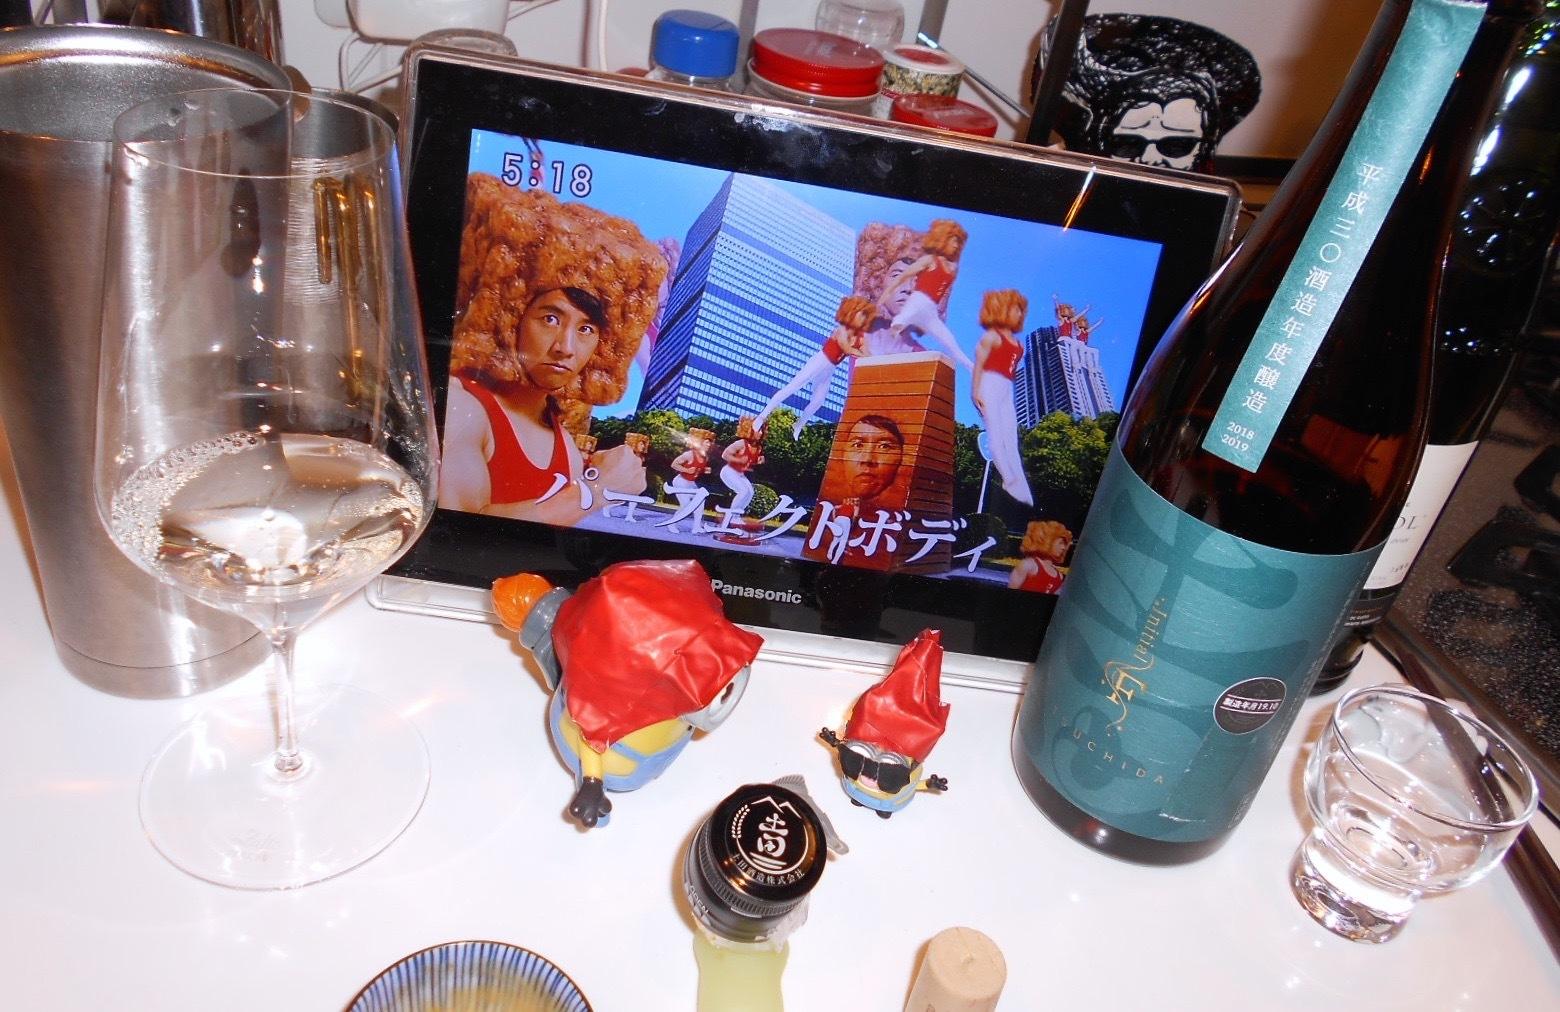 tsuchida_f30by6.jpg